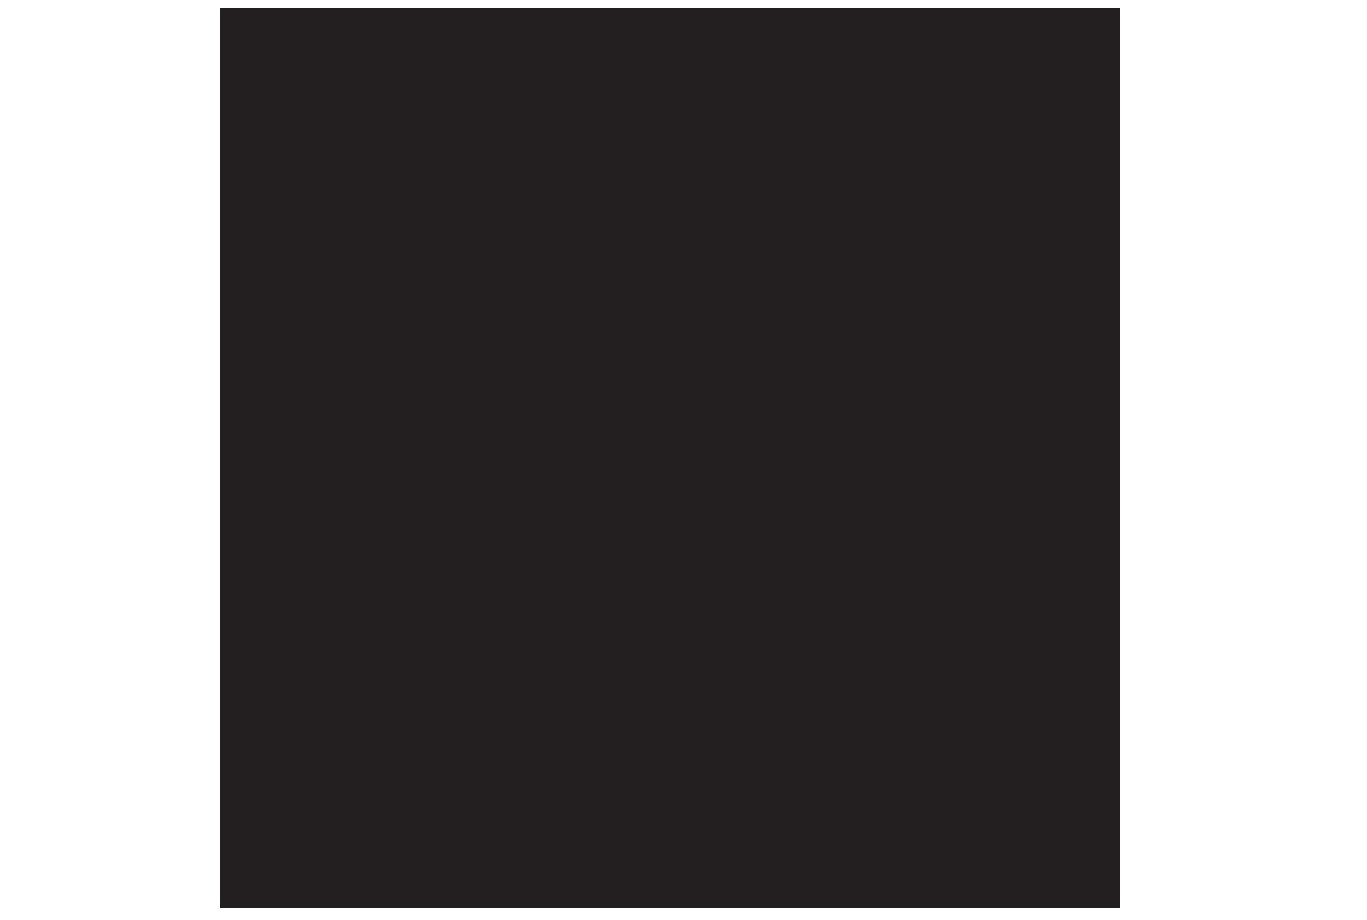 MoW _logo copy3.png